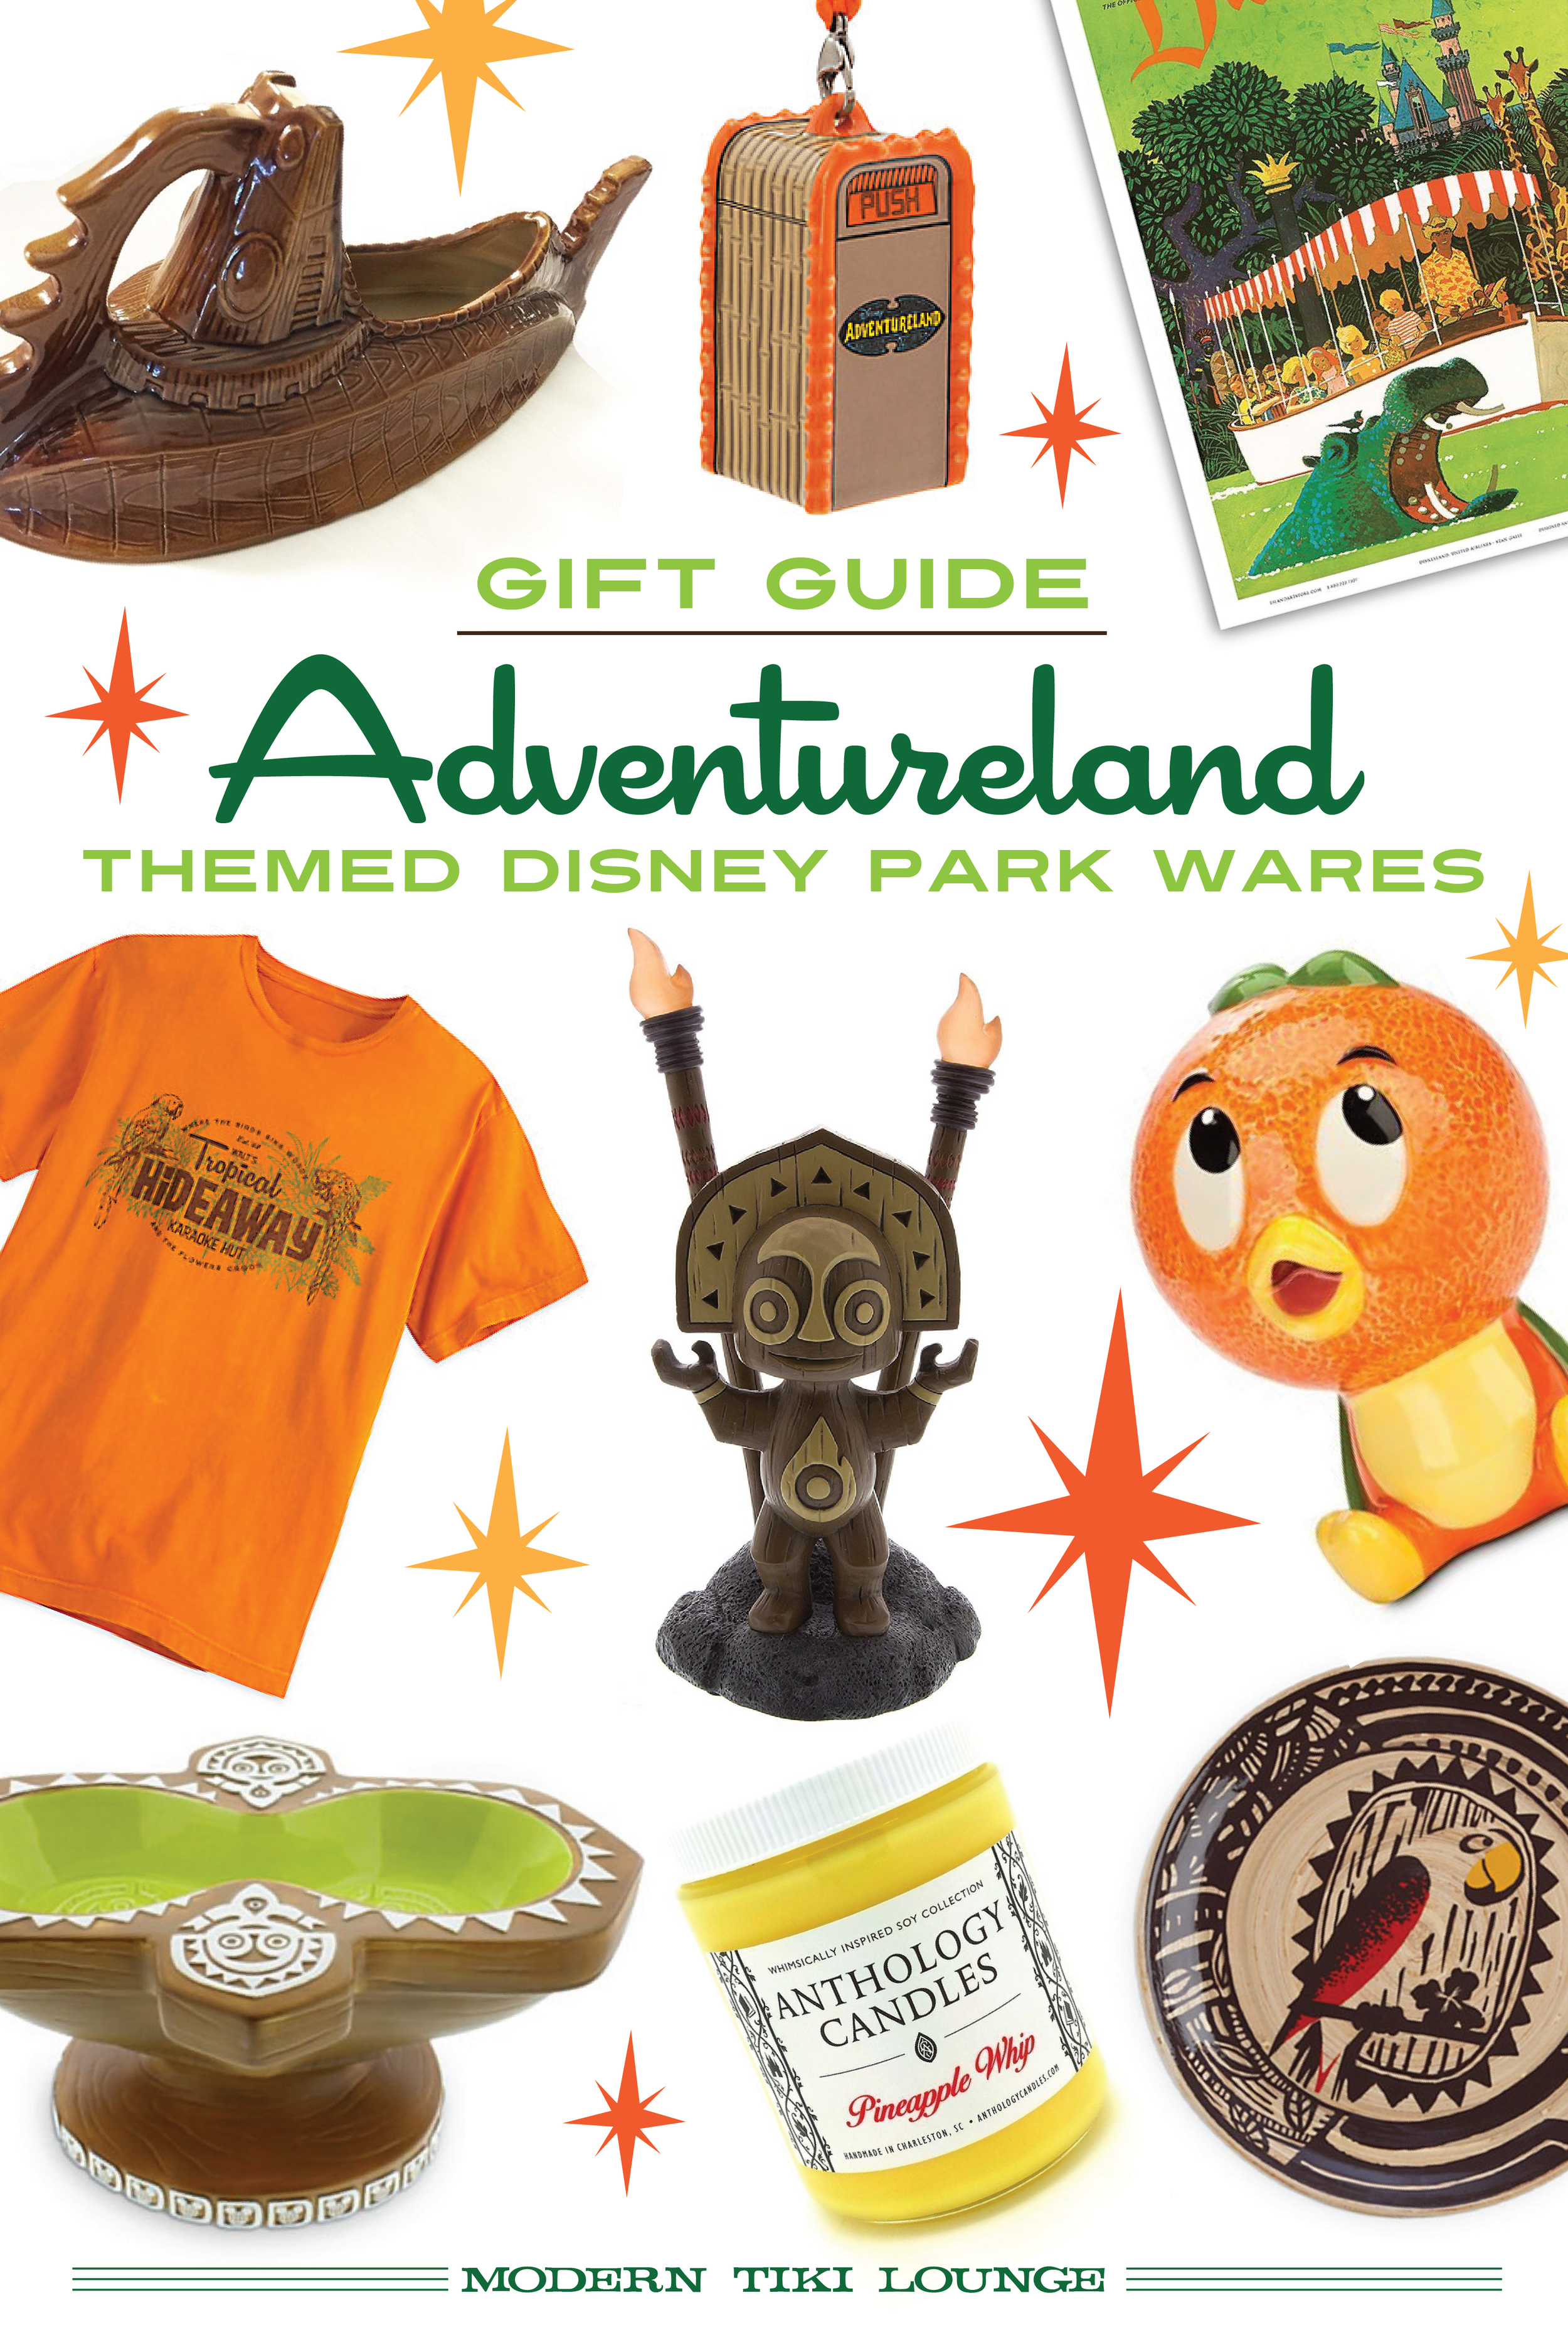 gift-guide-adventureland-disney-parks.jpg